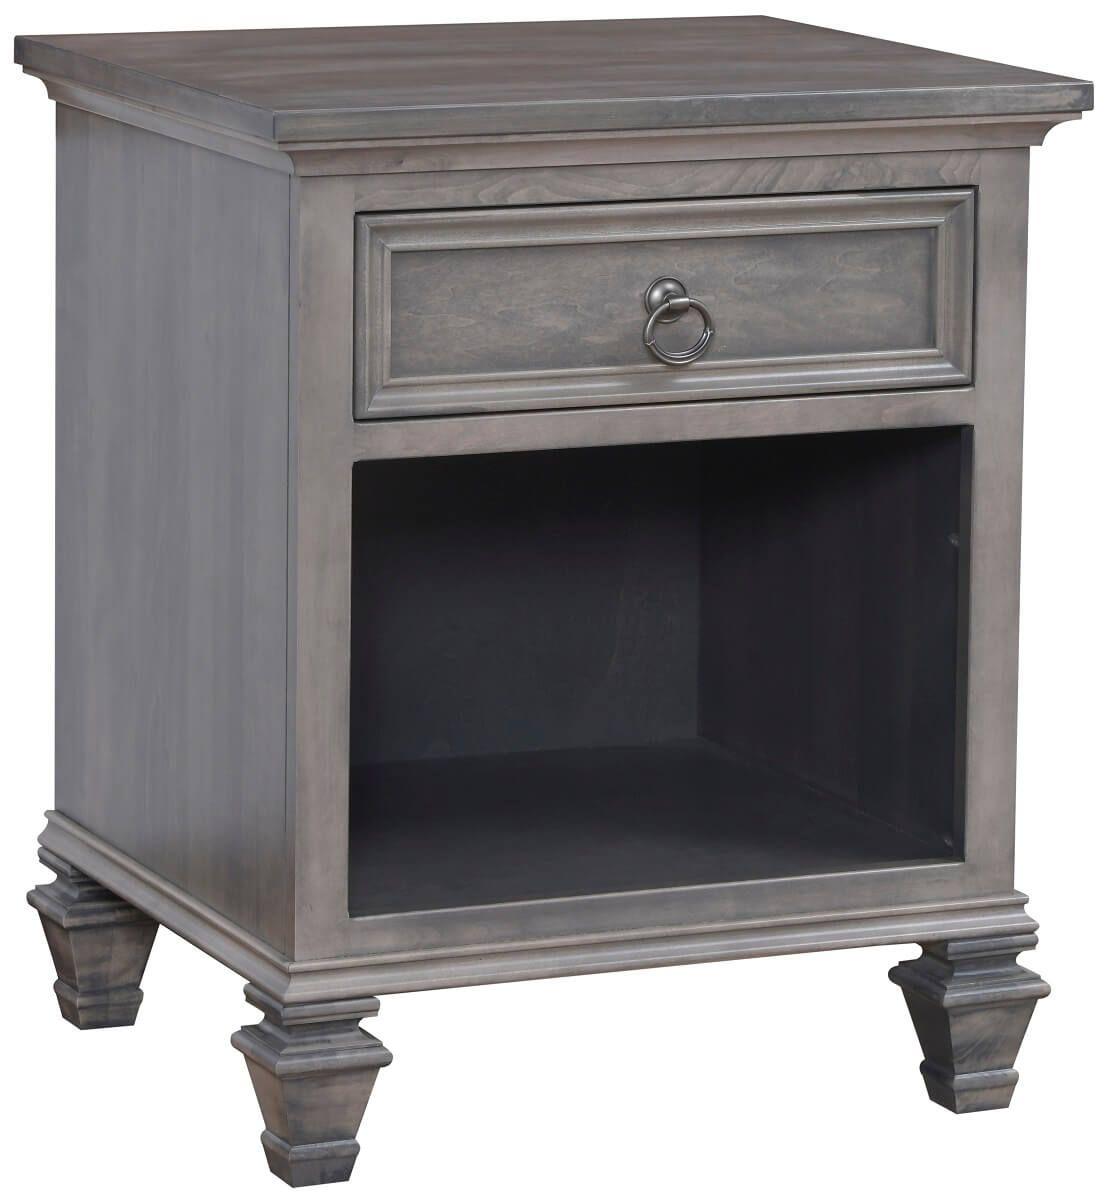 Autryville 1-Drawer Bedside Table